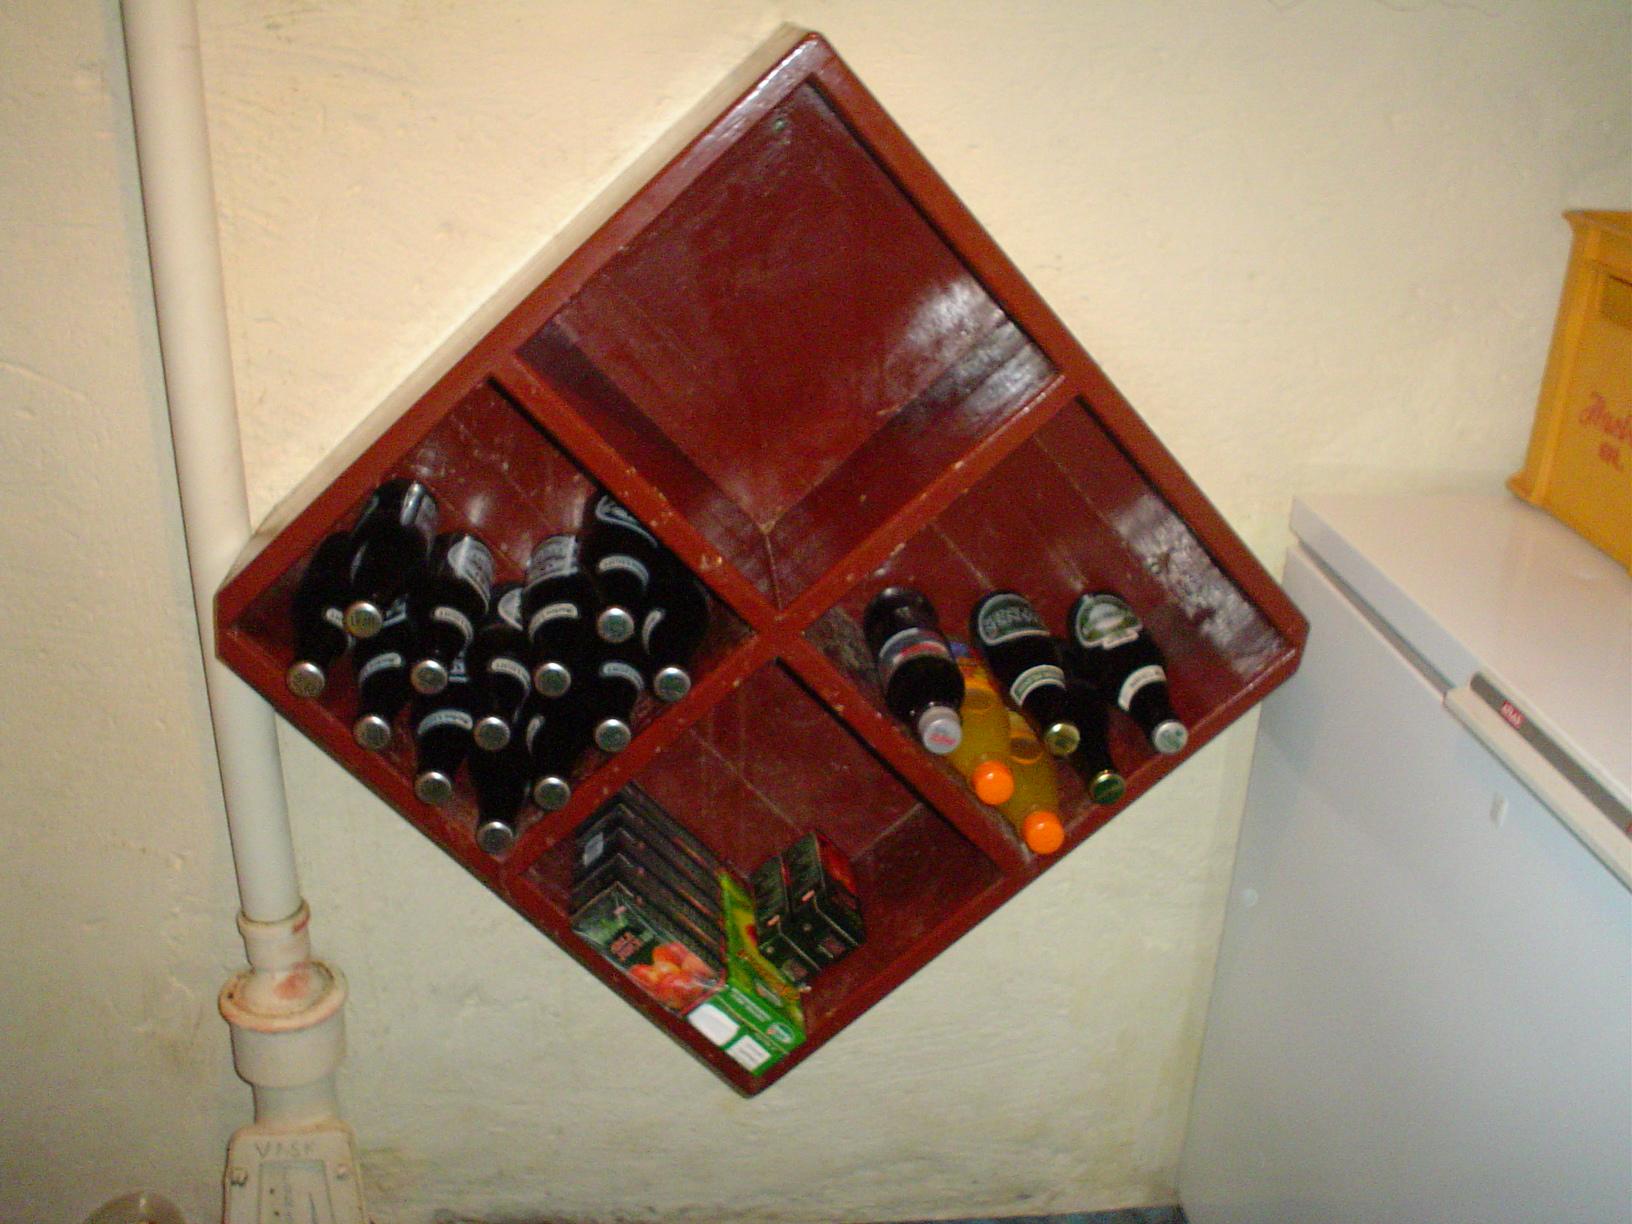 Trækassen med øl og sodavand